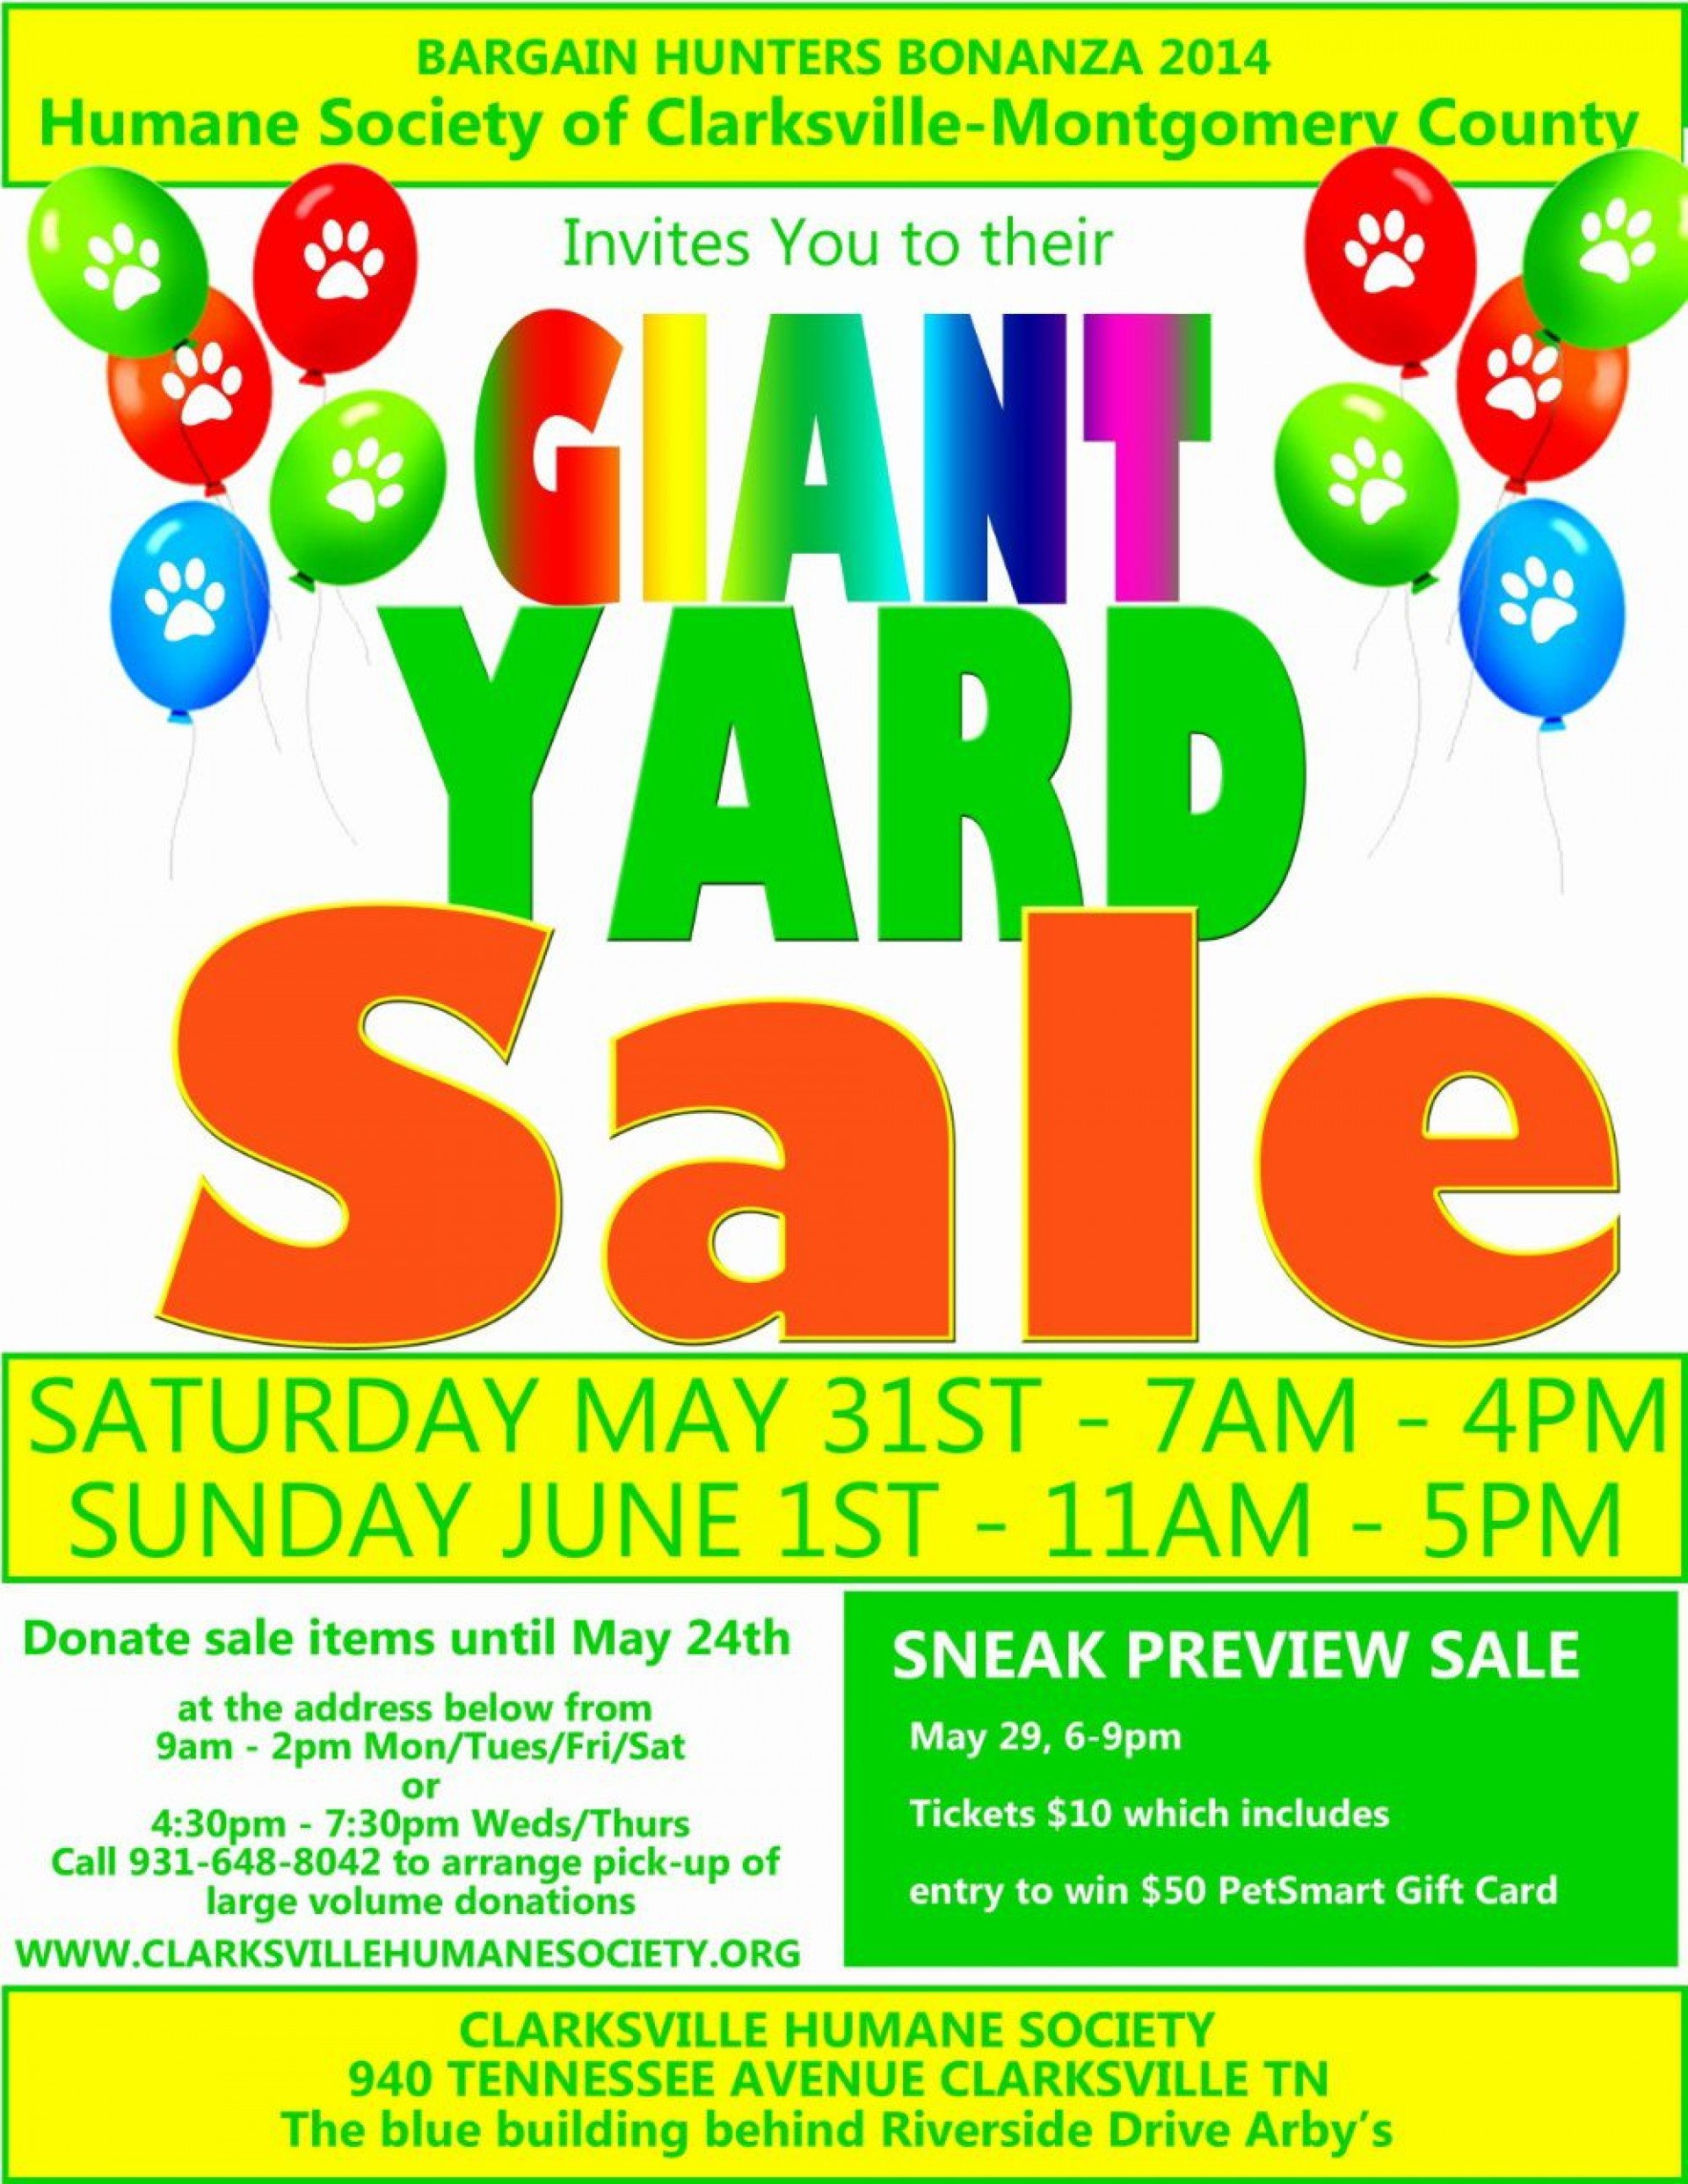 007 Outstanding Garage Sale Flyer Template Free Sample  Community Neighborhood Yard1920